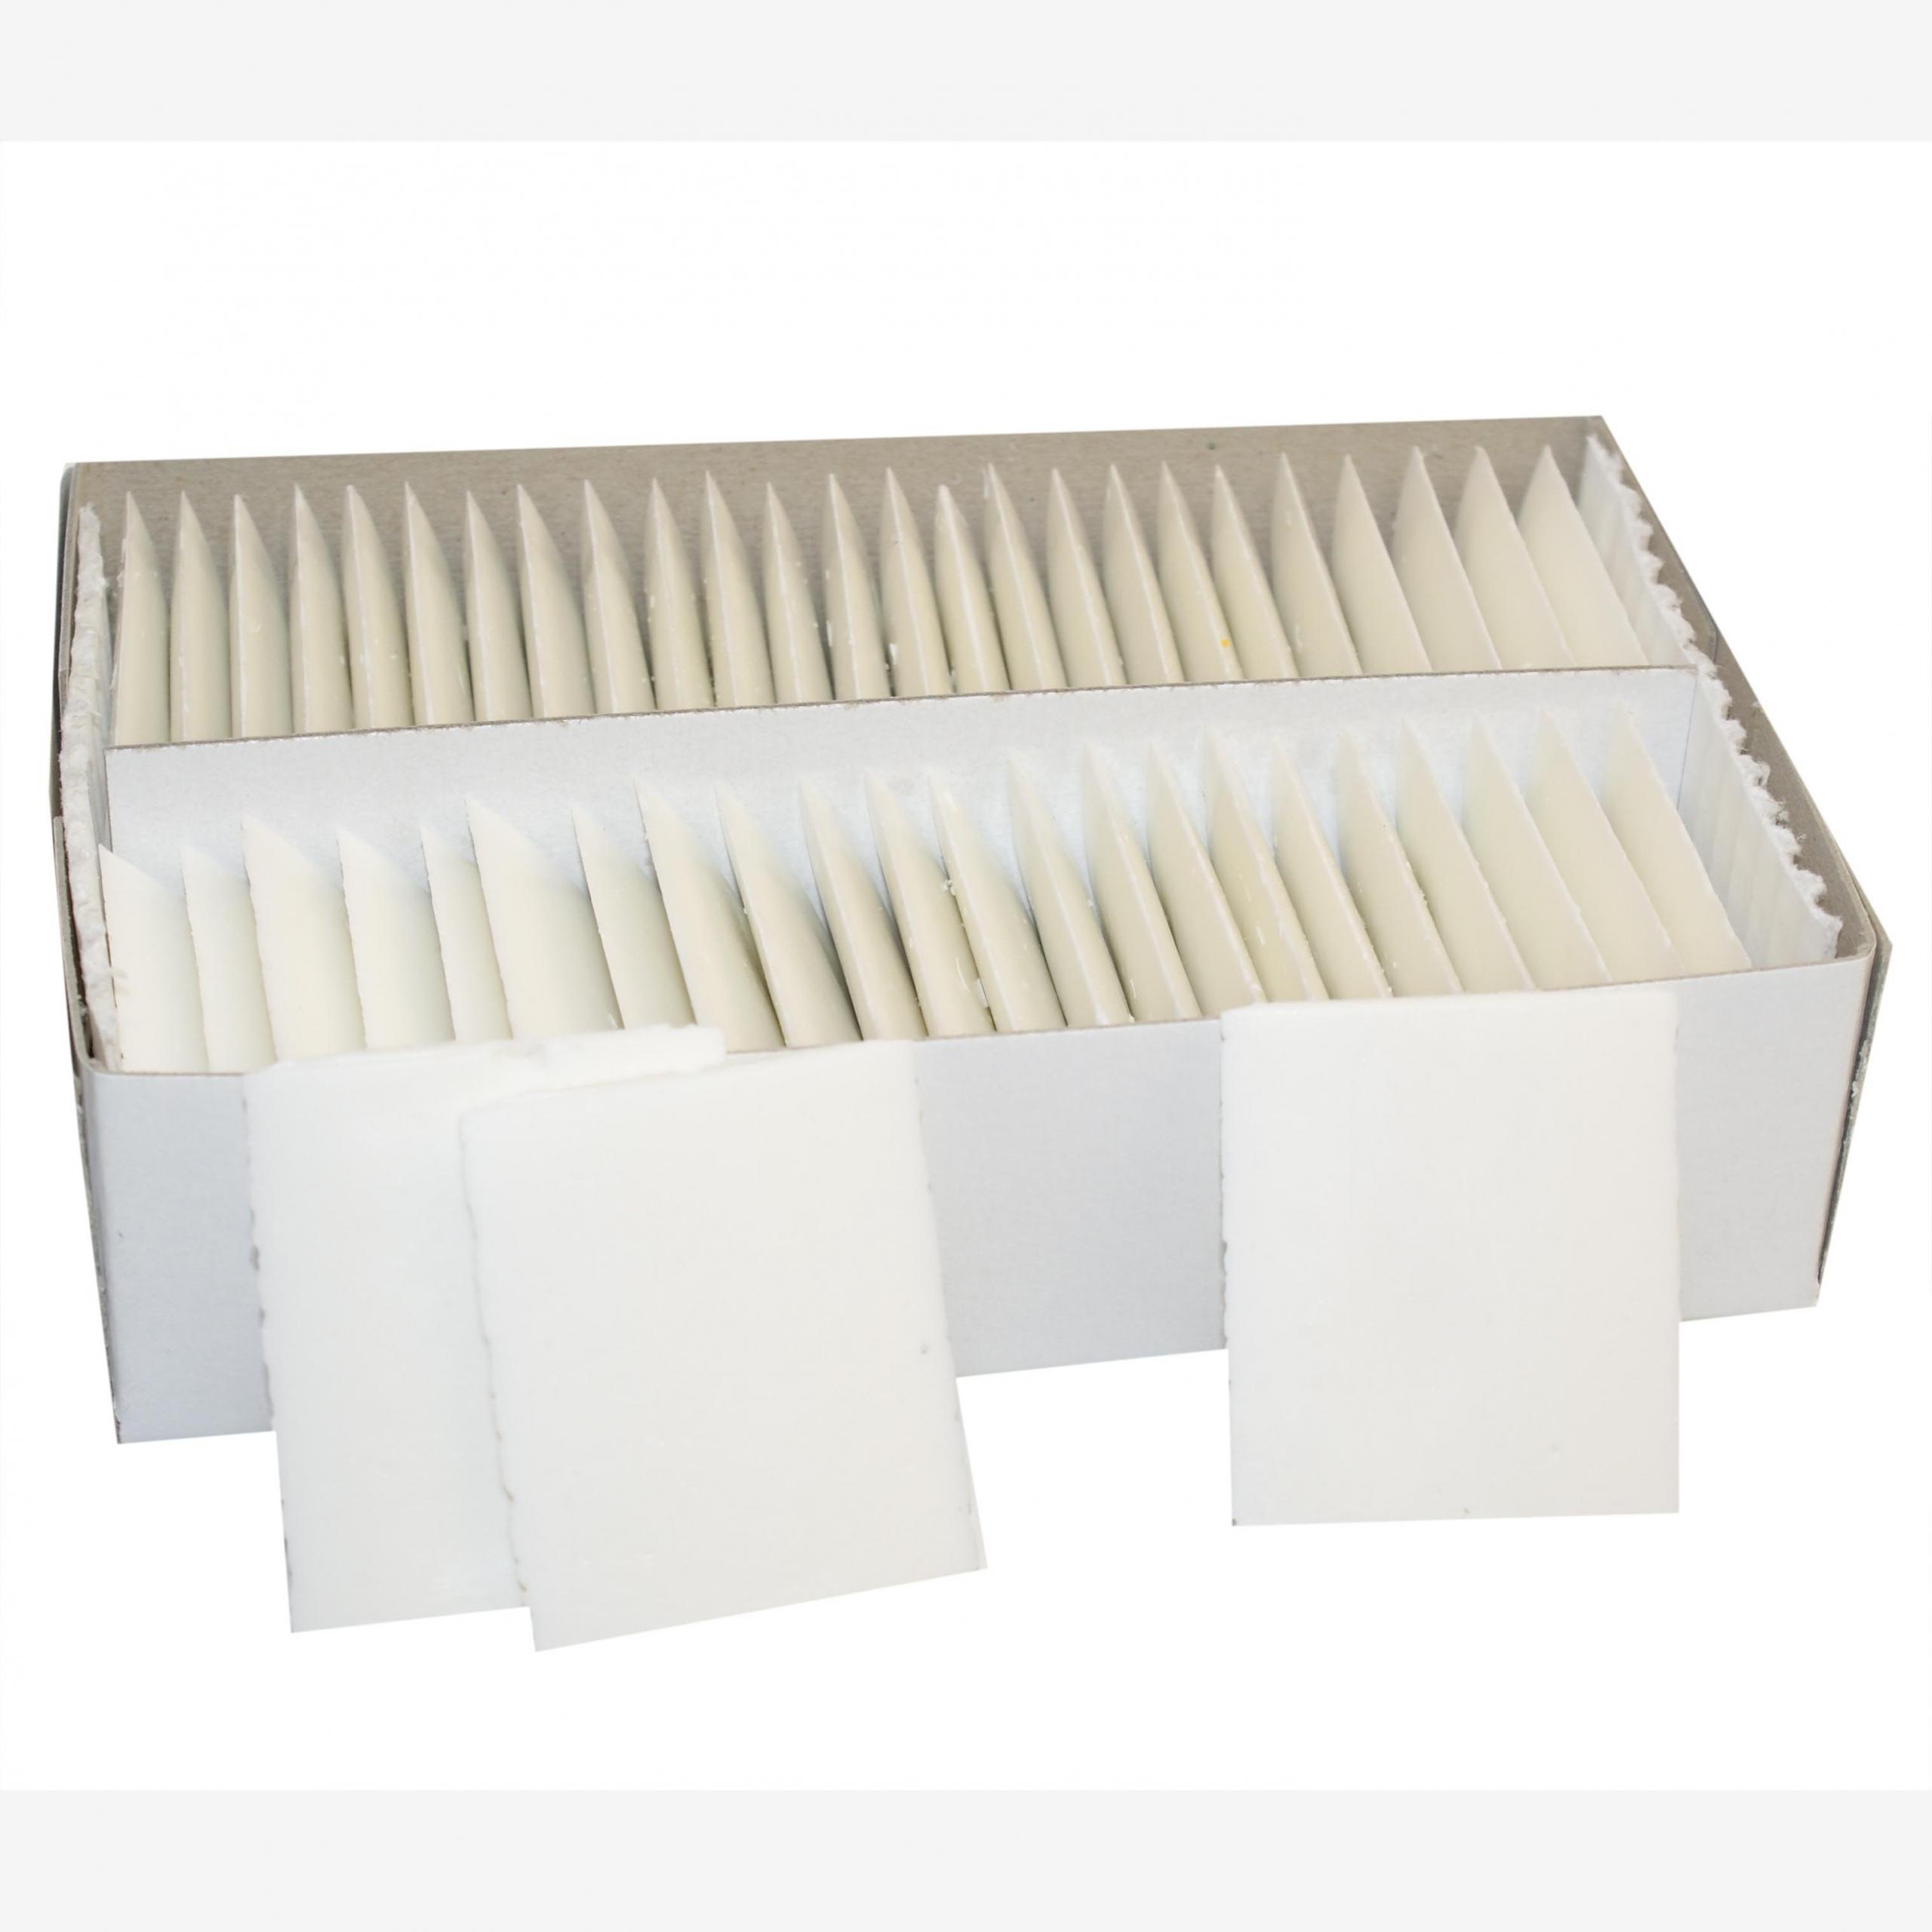 Argo Garment Wax (Box of 50)-2910